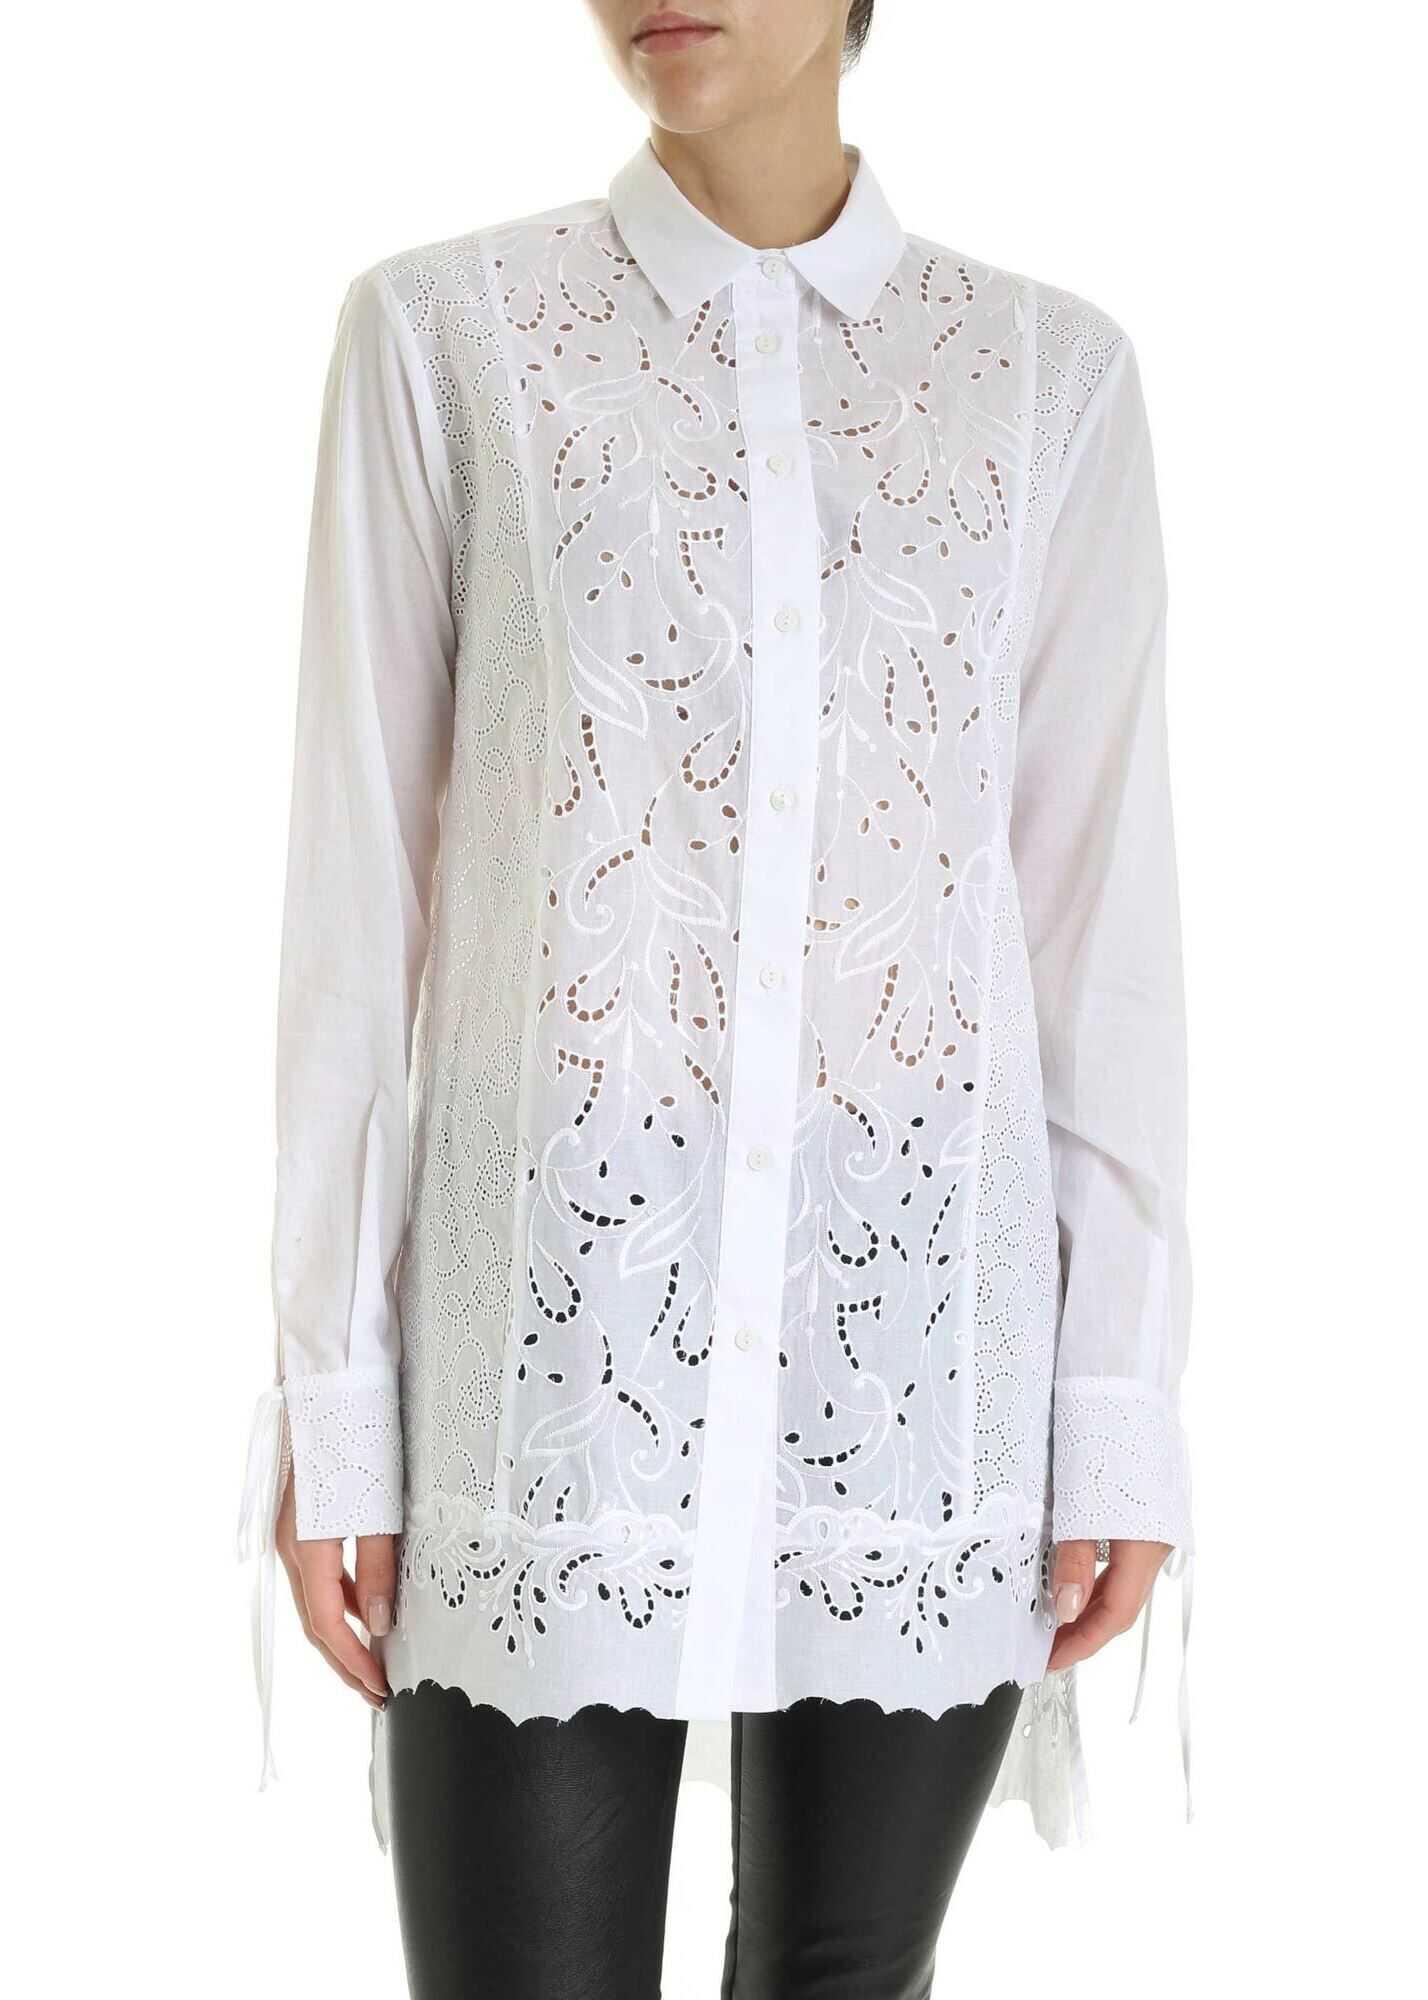 Ermanno Scervino Sangallo Long Fit Shirt In White White